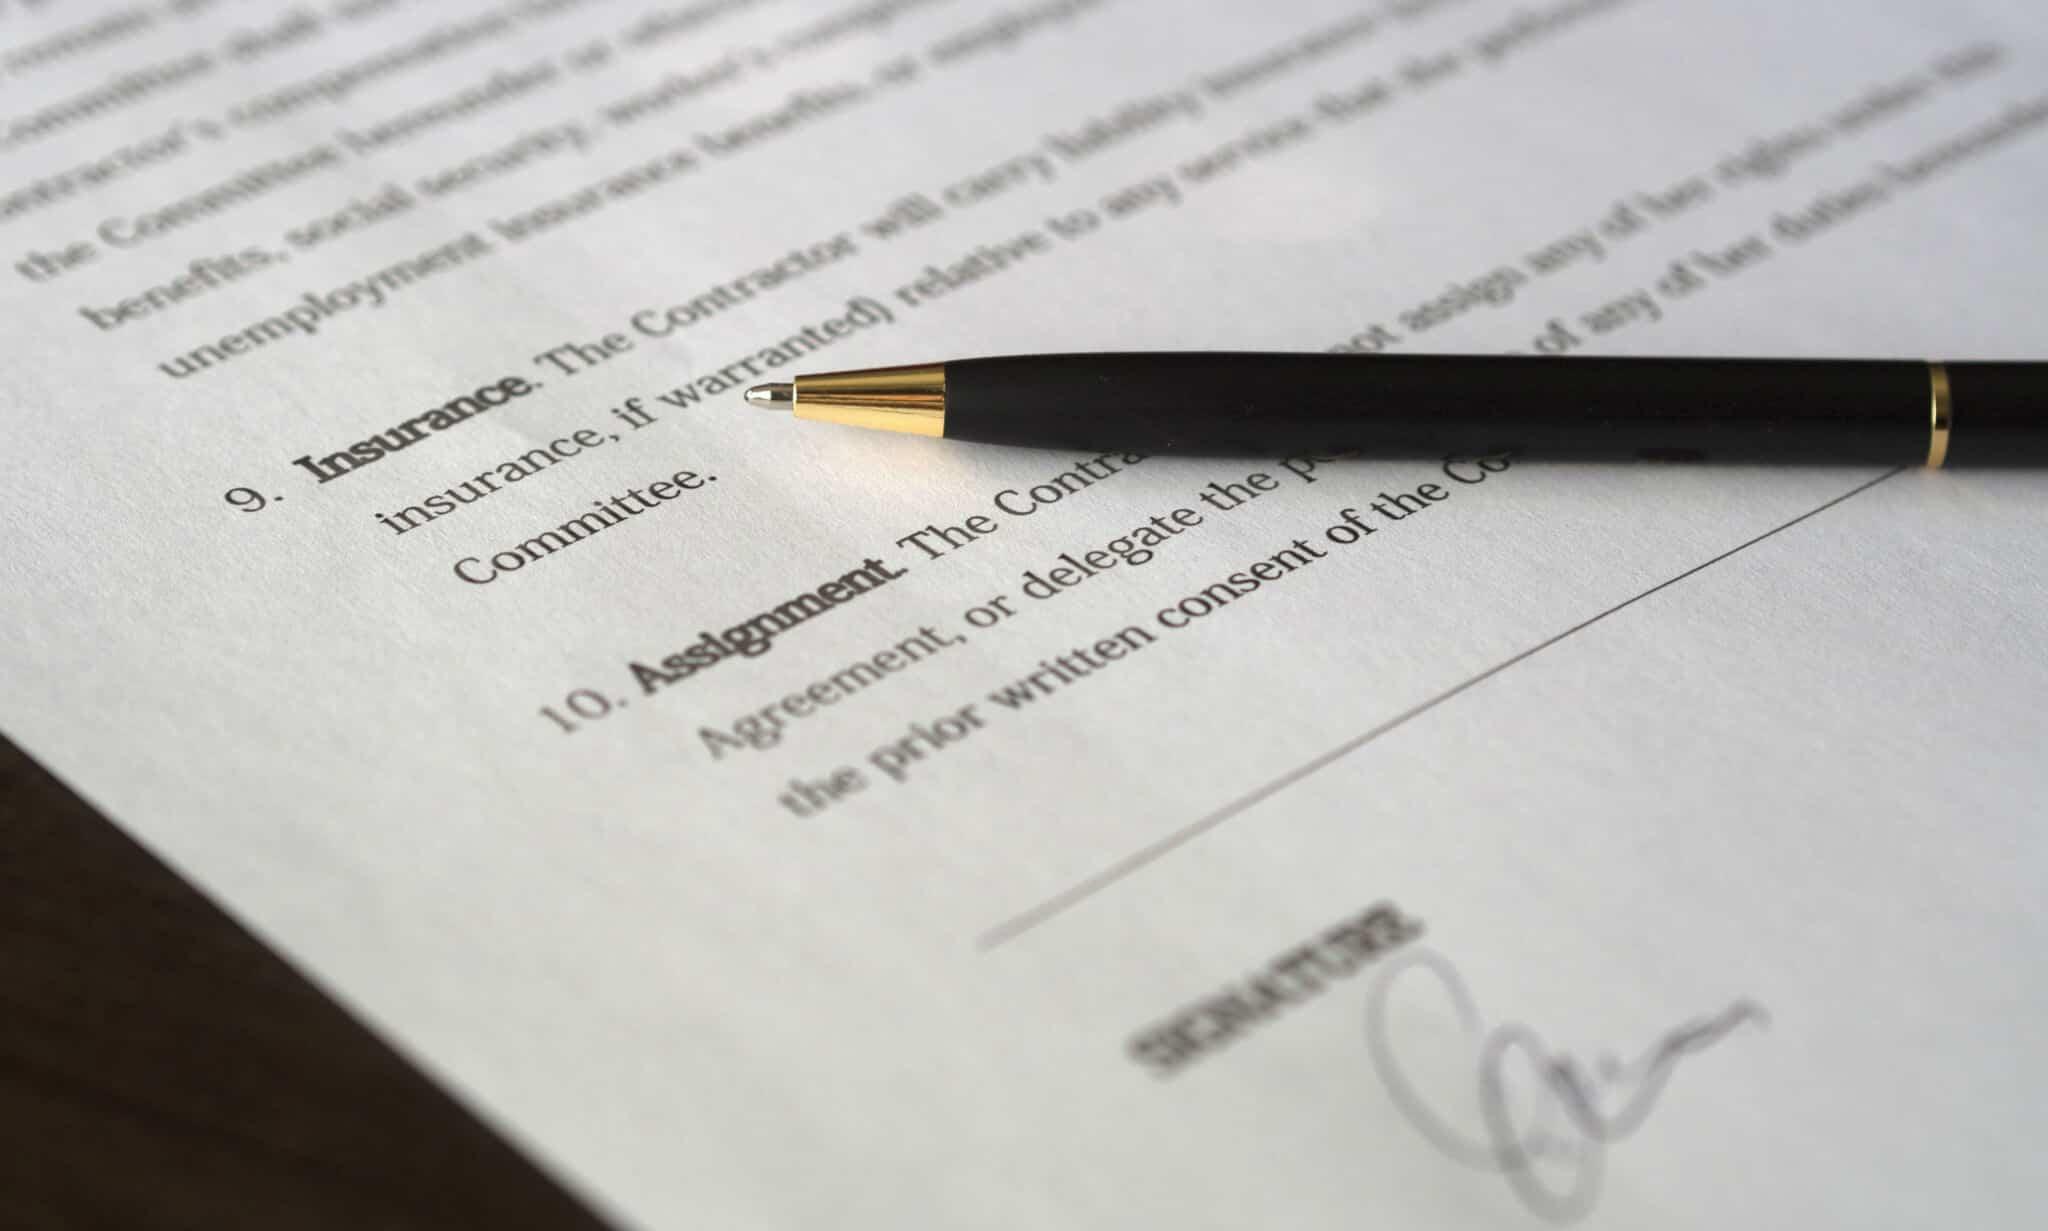 cpcv contrato em cima da mesa